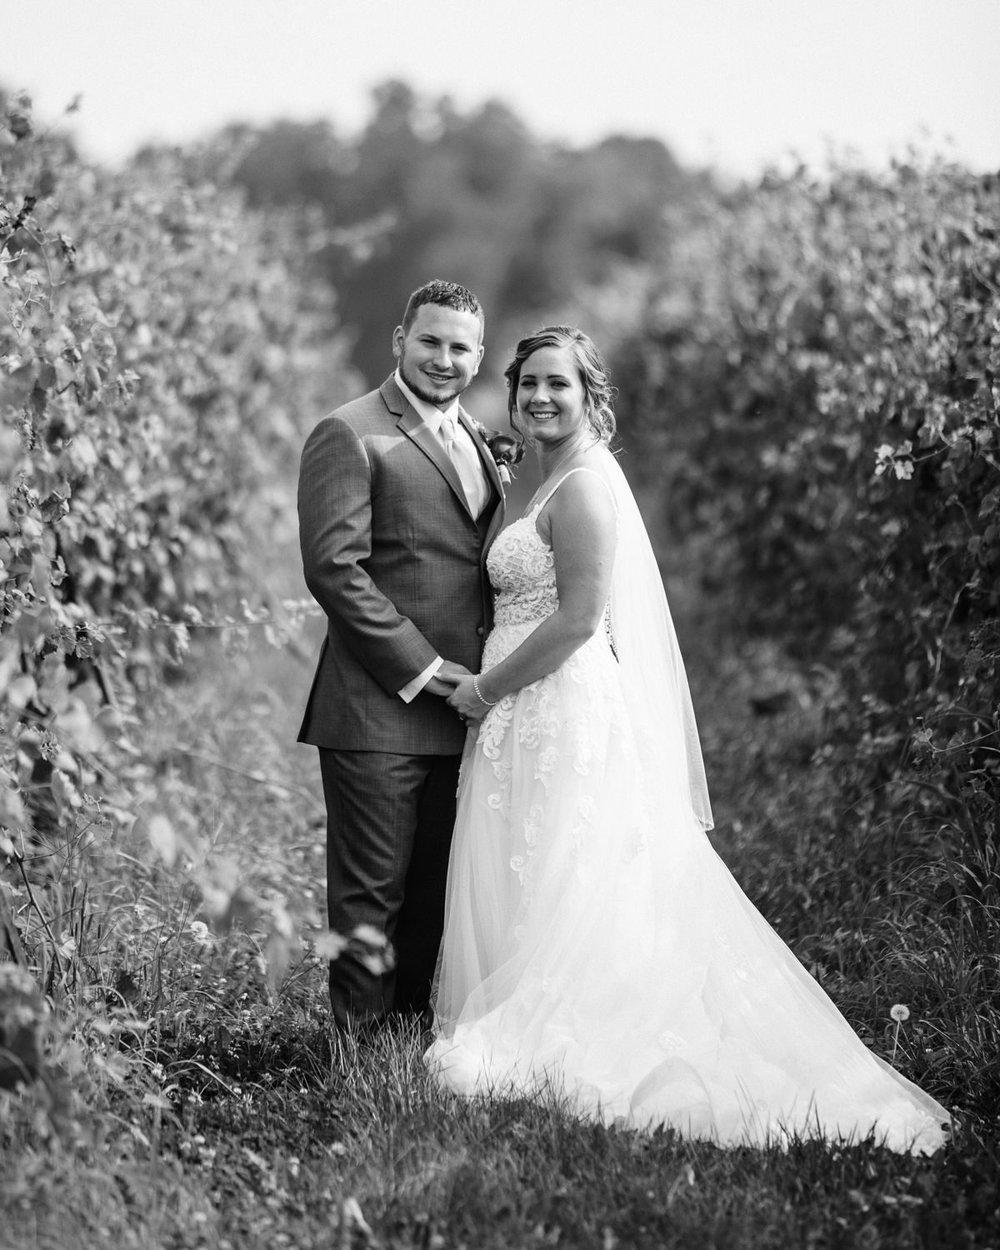 Chase and Chelsea wedding blog photography grant beachy elkhart south bend goshen -037.jpg